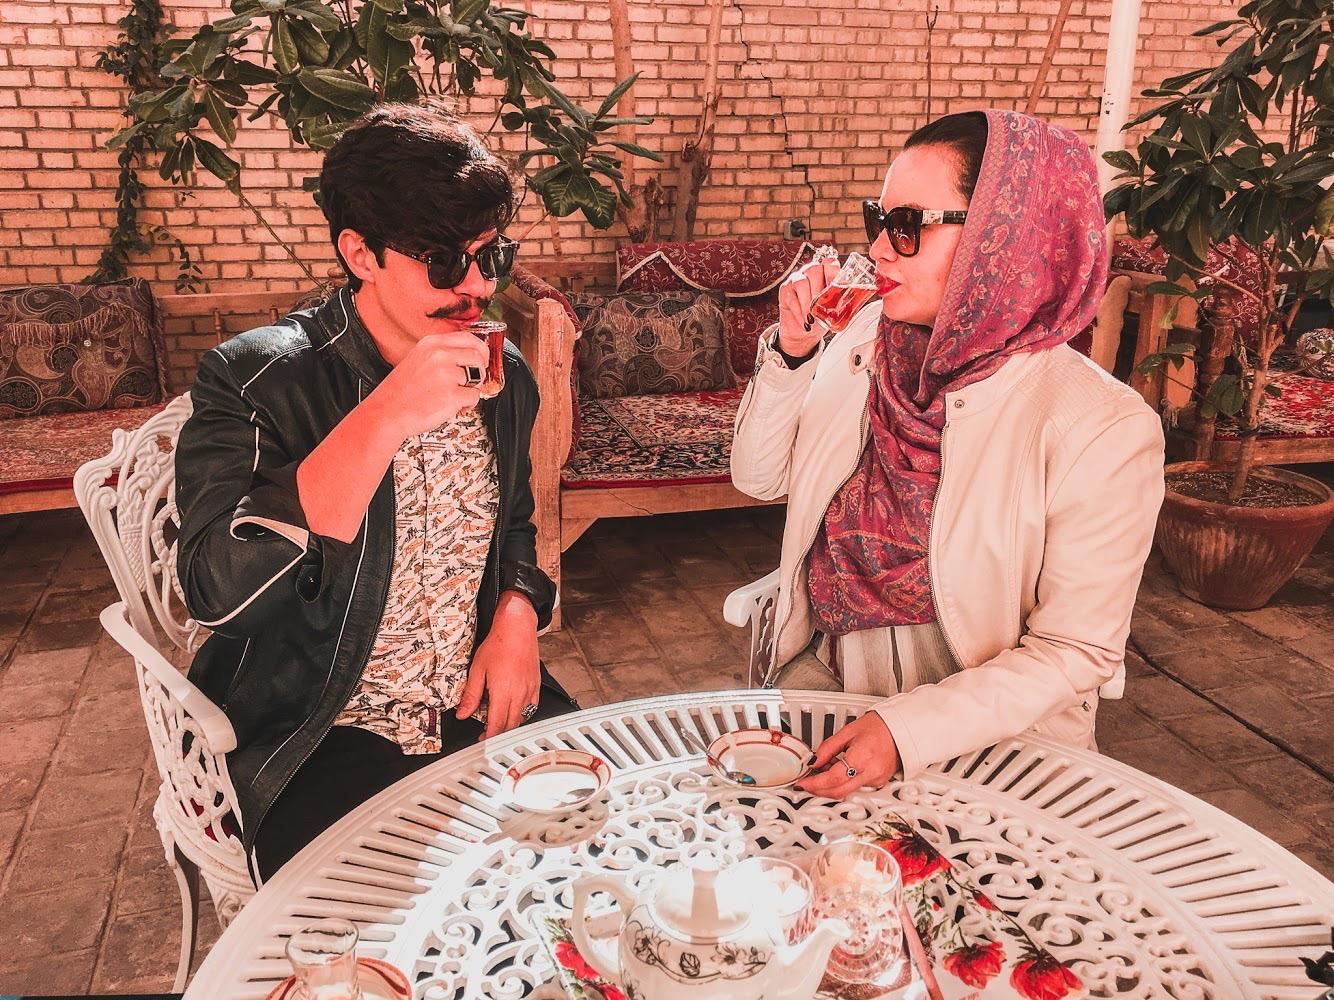 Mulheres no Irã